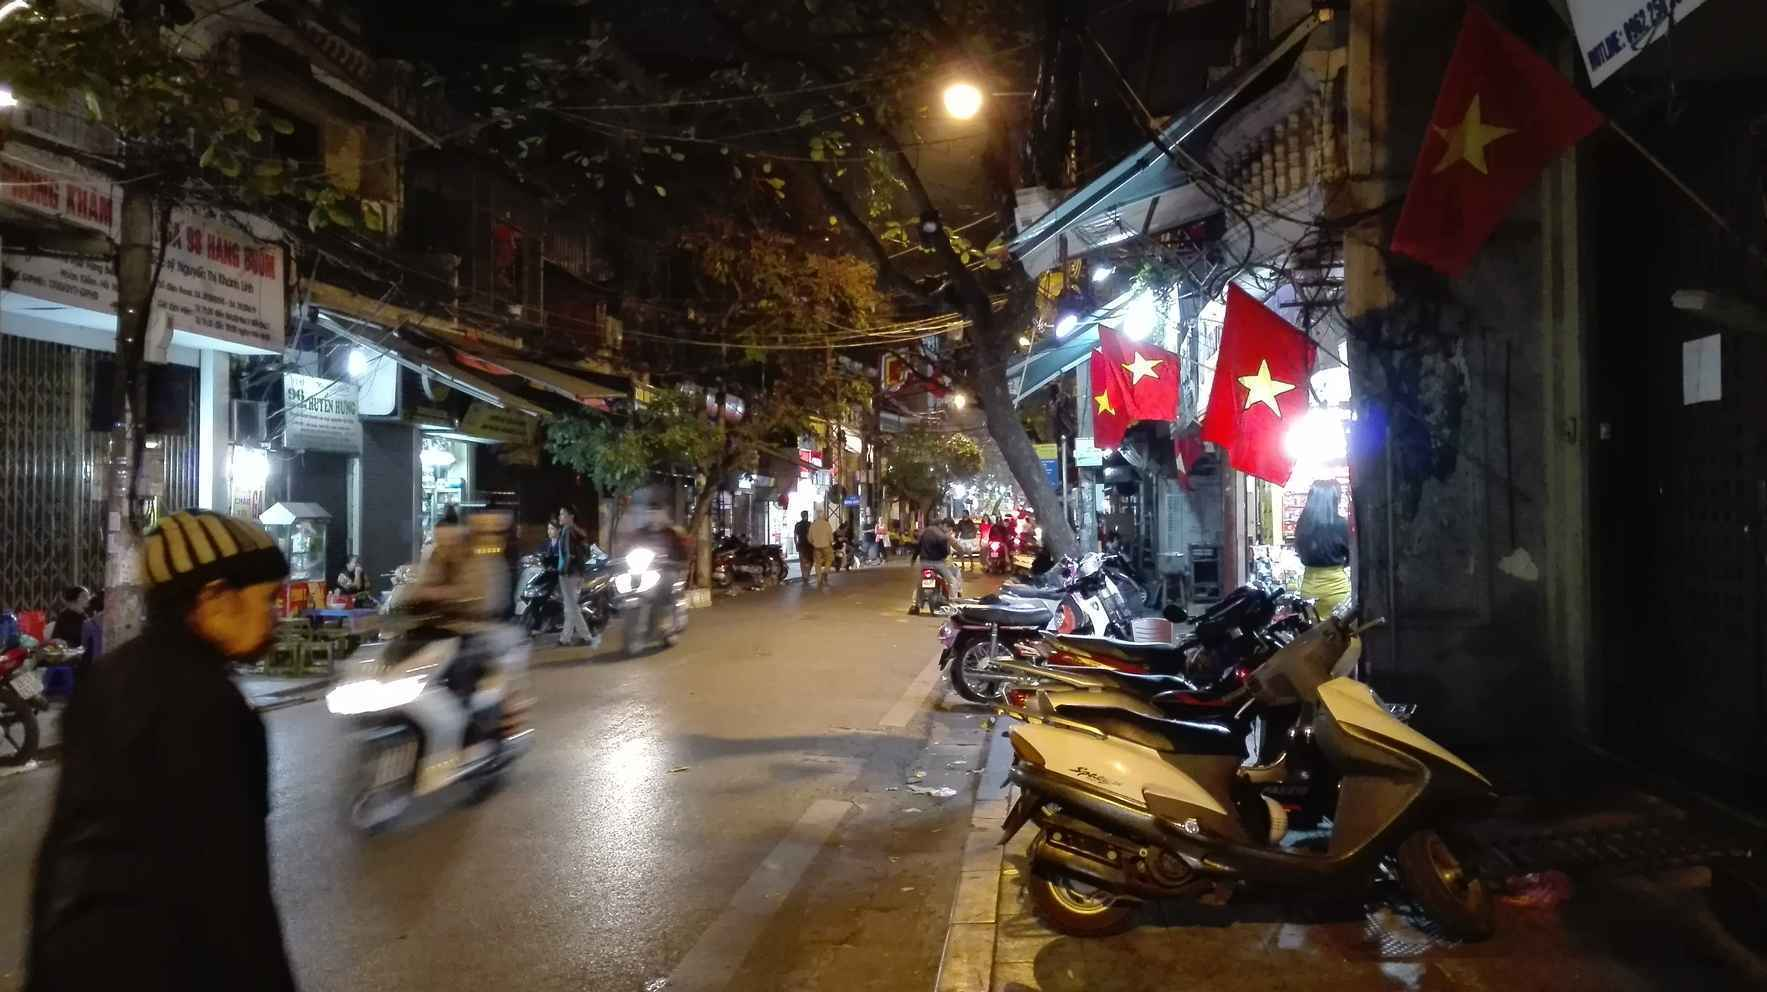 I'll bring help and hope to Hanoi Rehab Center image